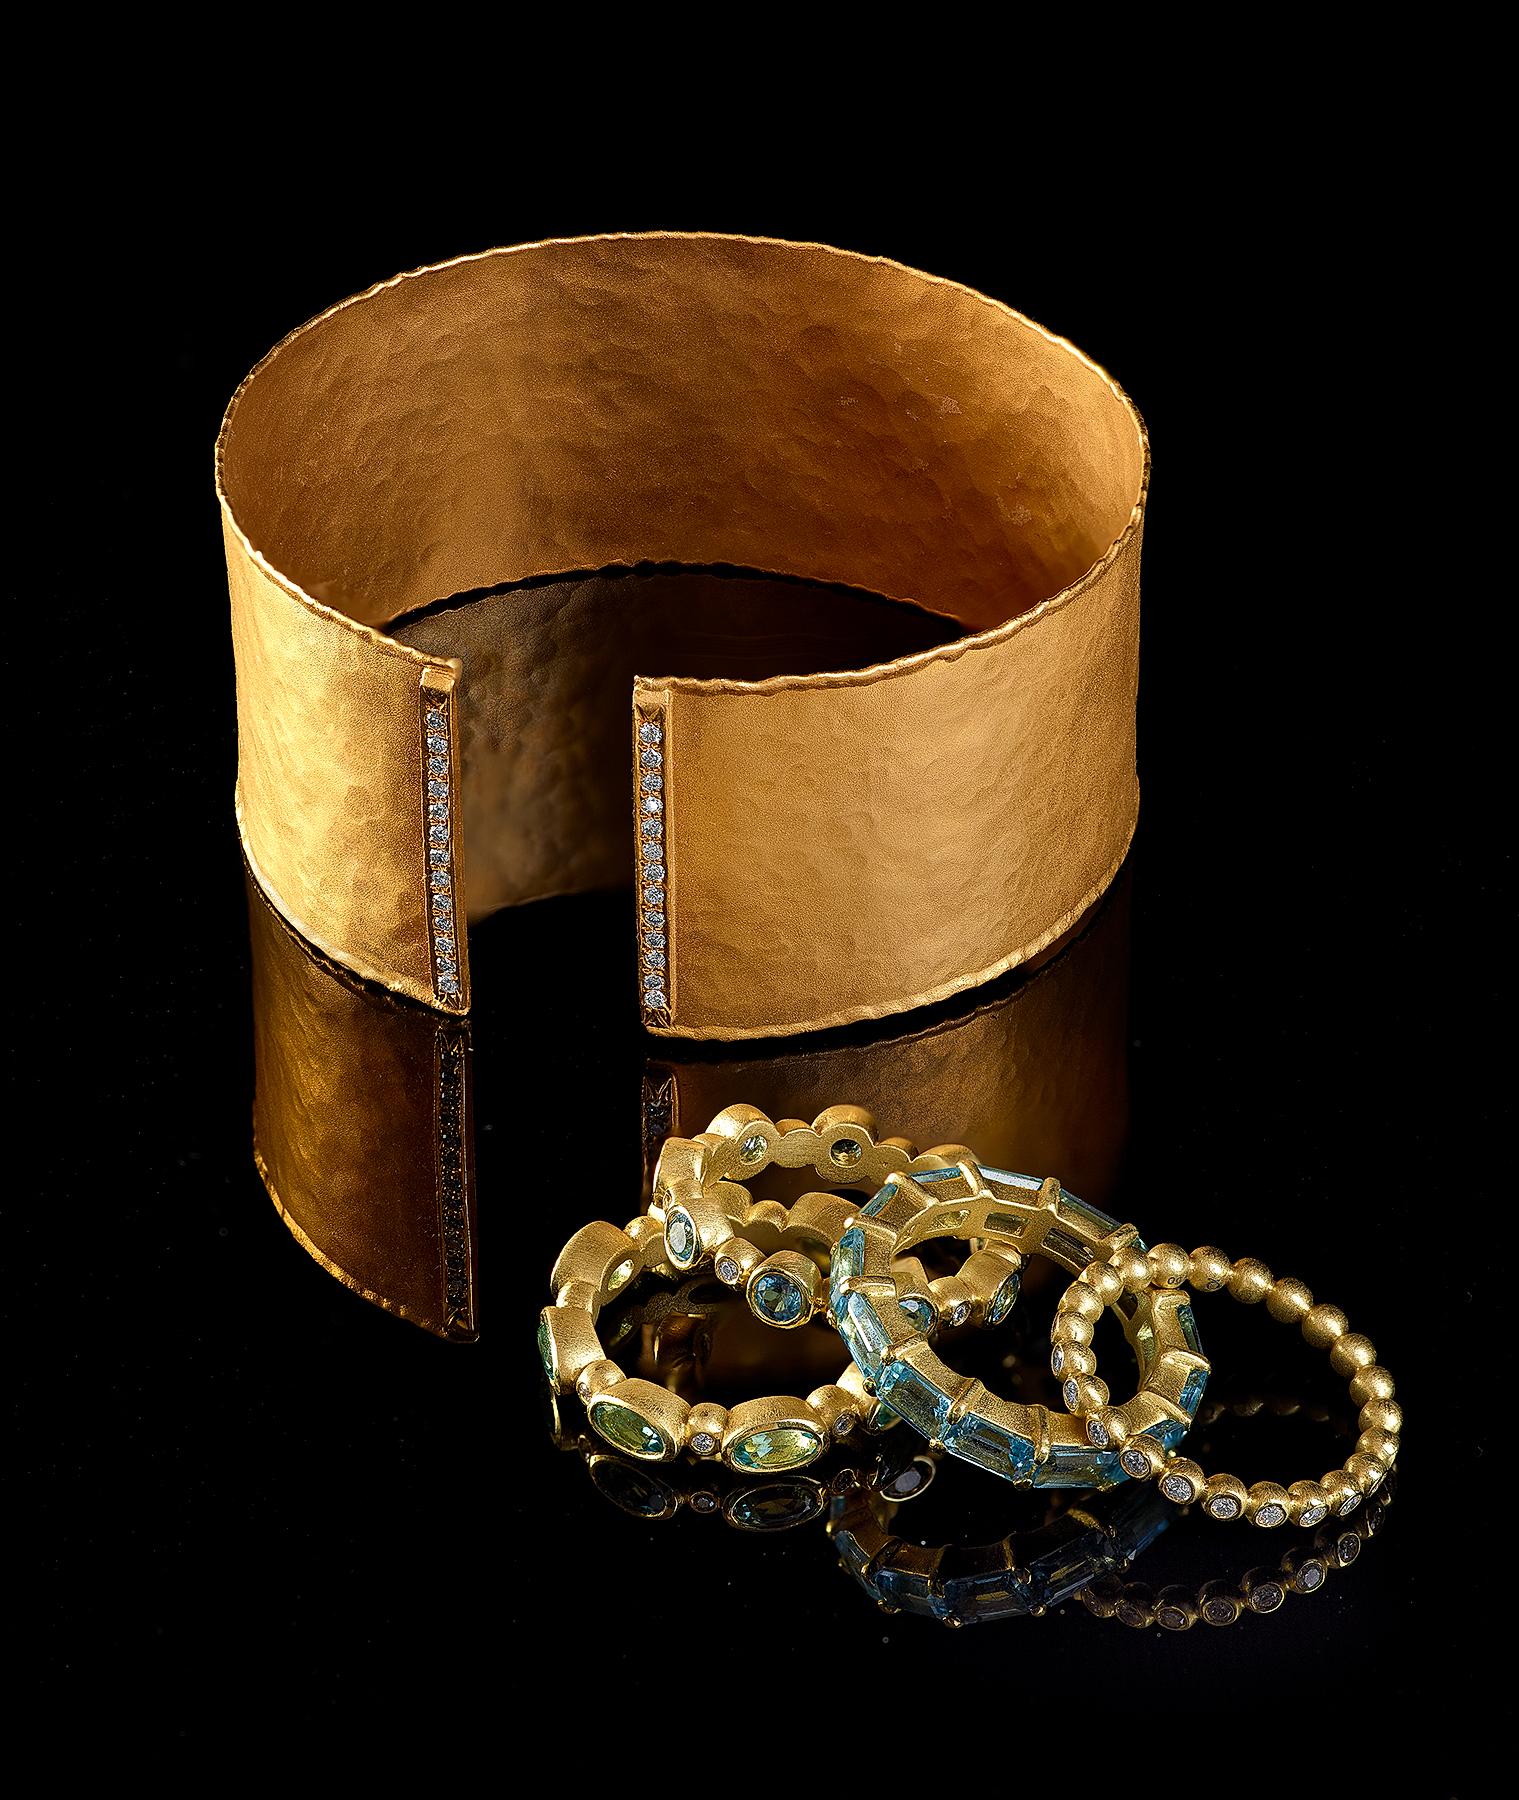 C2016 Holger Obenaus Photography Jewelry